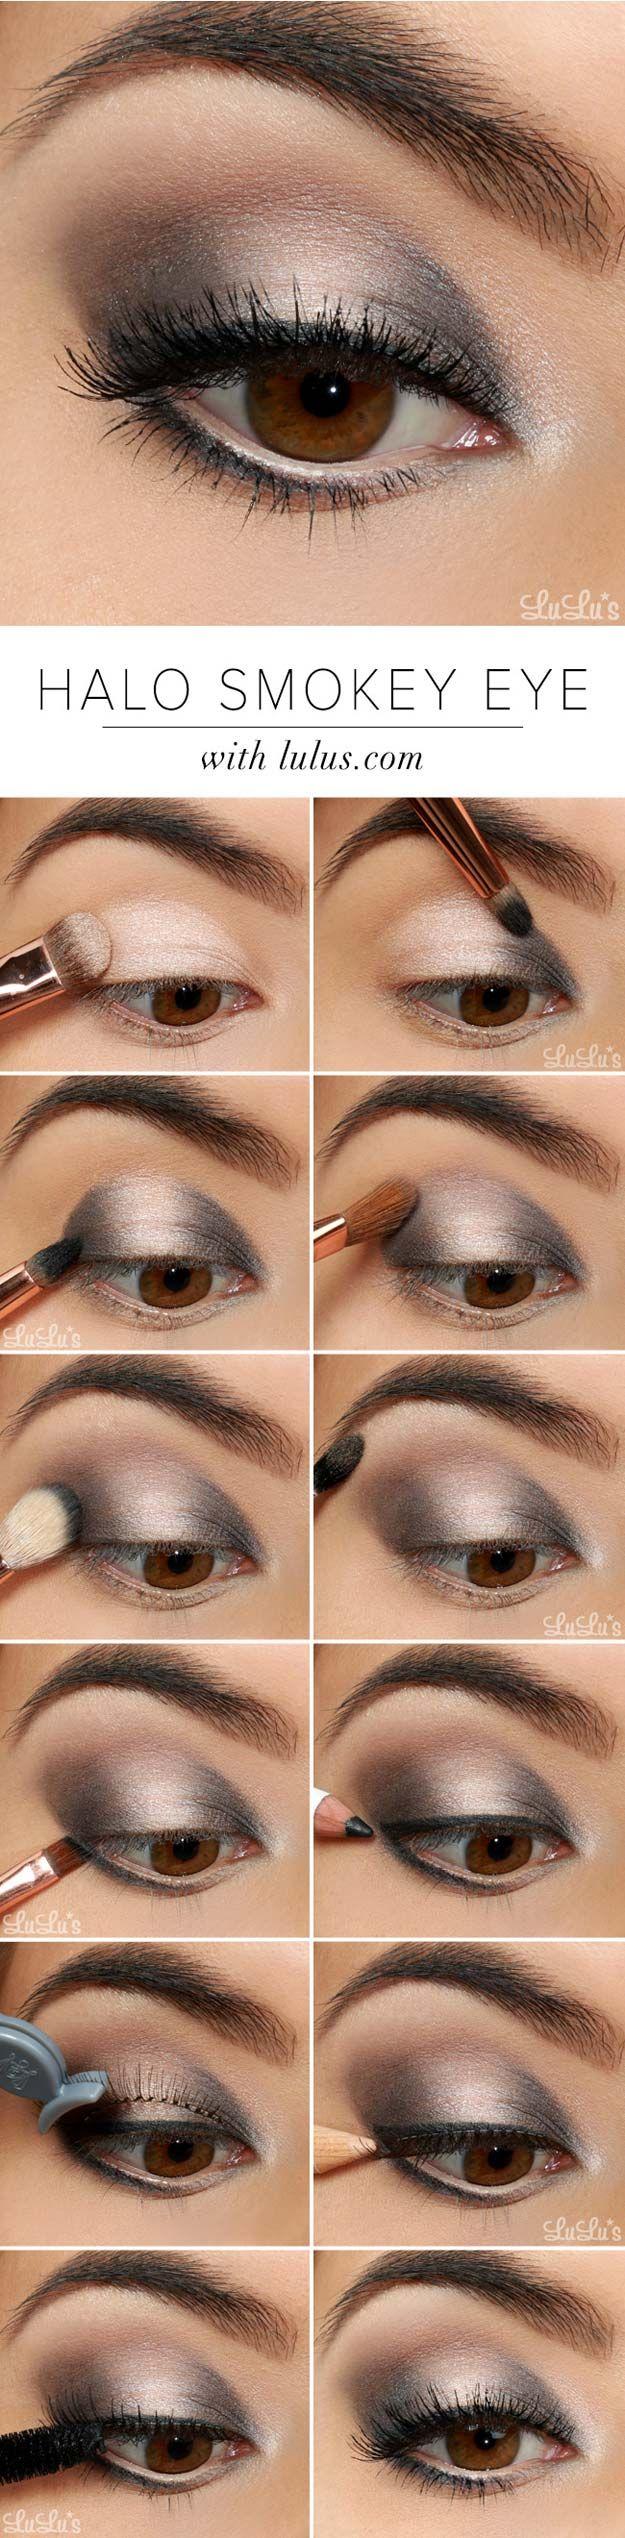 Pimple under nose piercing   best Hair makeup nails  images on Pinterest  Health Beauty